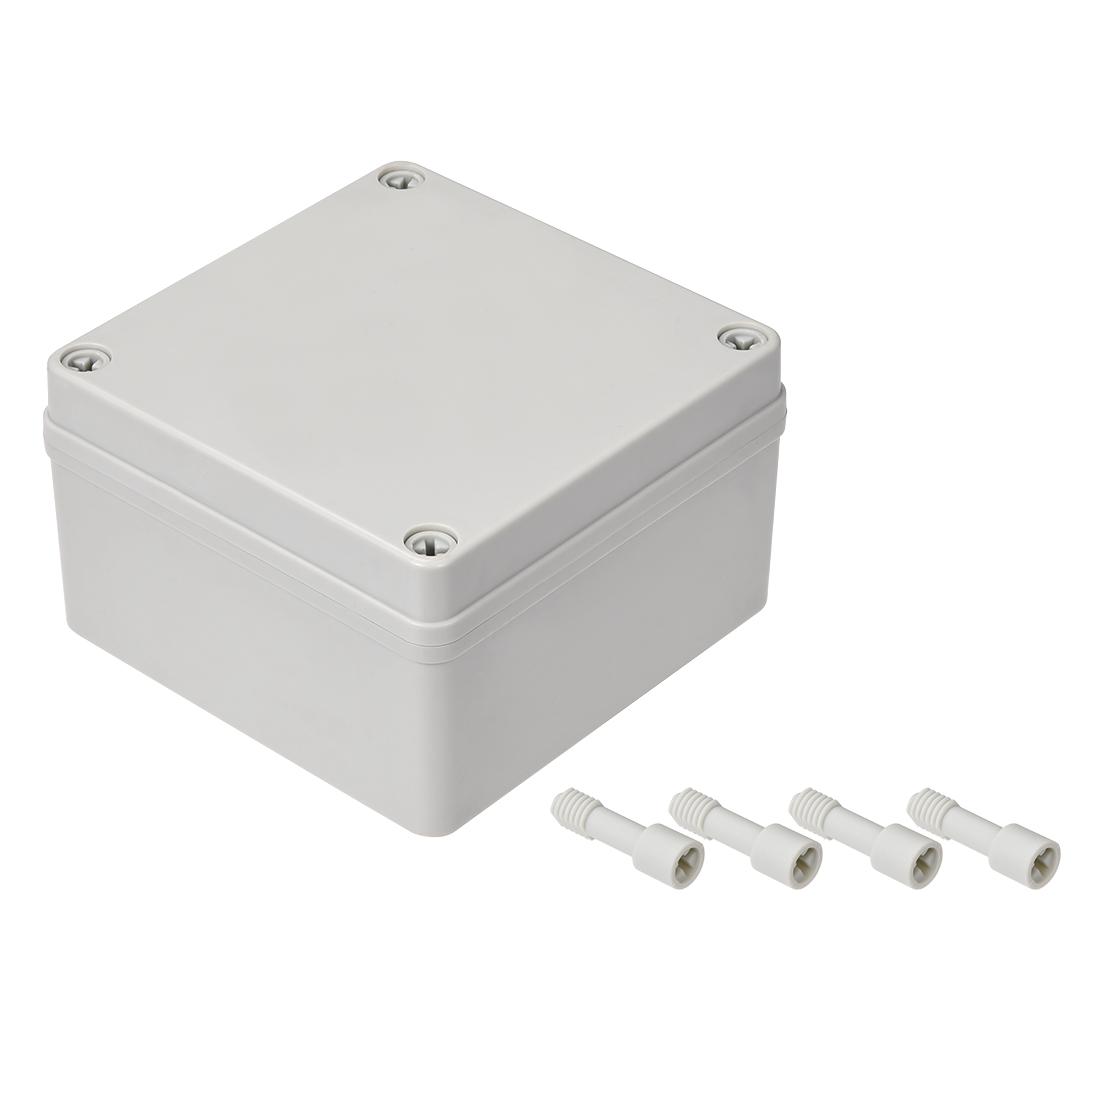 125mmx125mmx75mm Dustproof IP65 Junction Box DIY Case Enclosure Gray